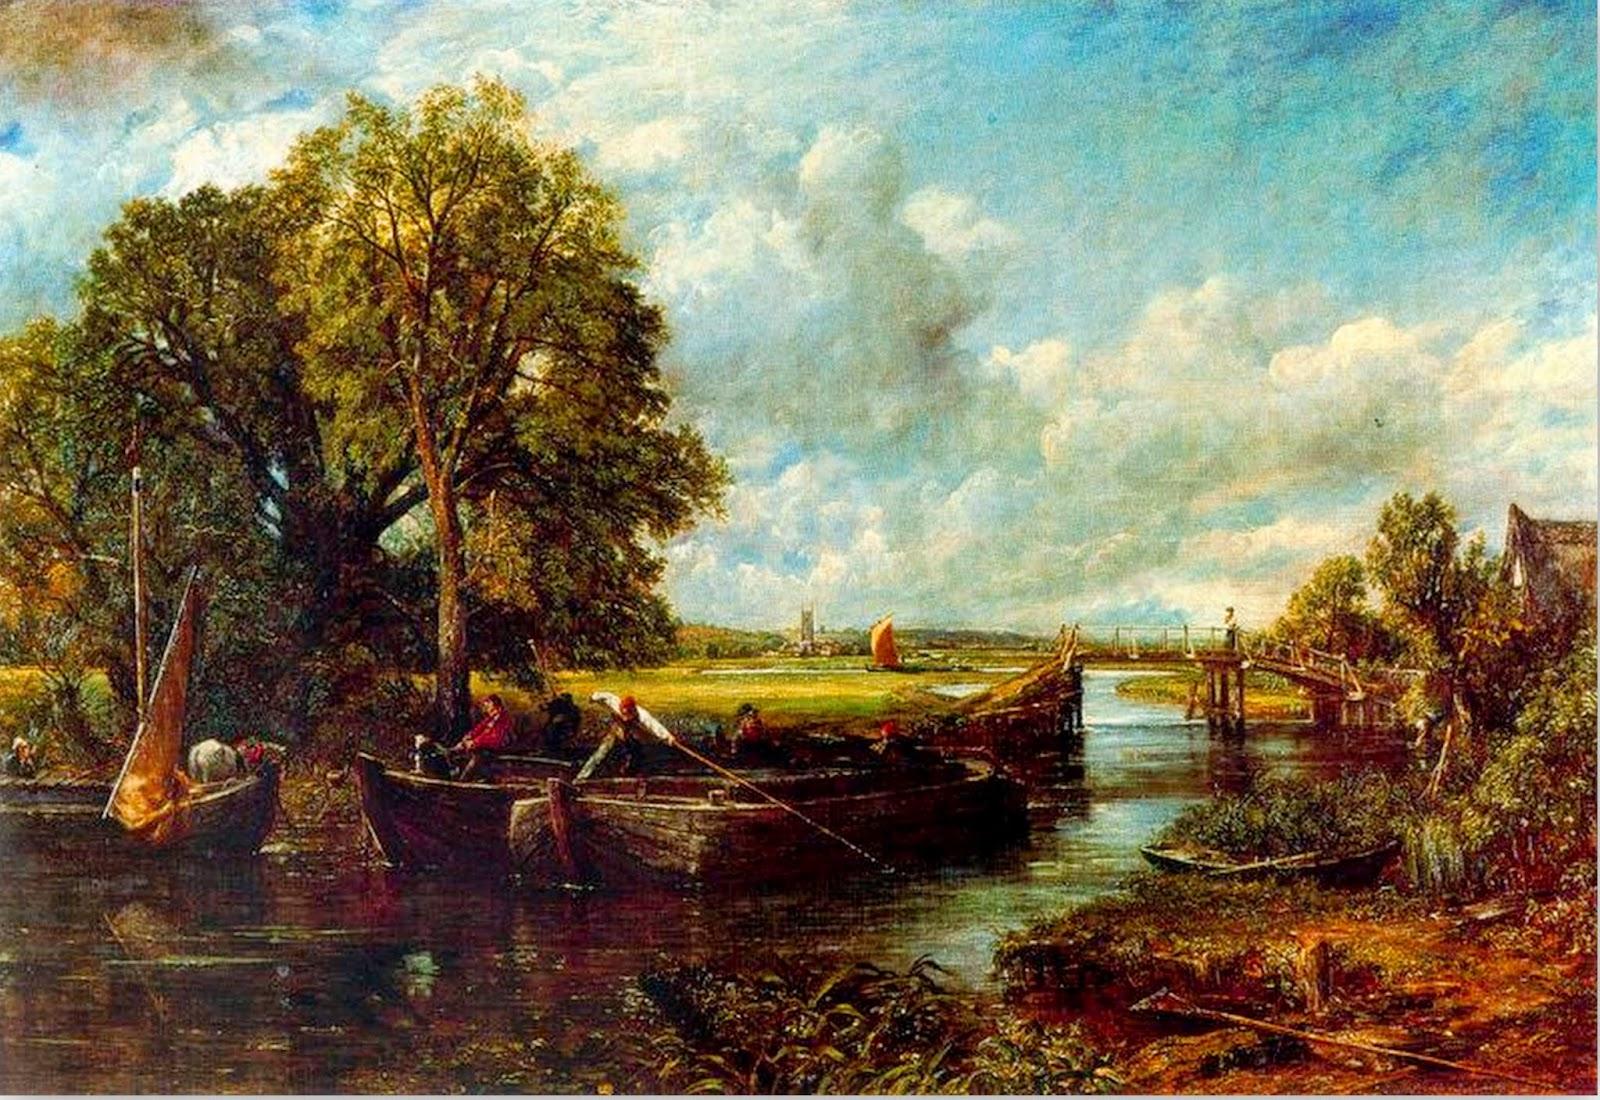 paisajes-clasicos-campesinos-de-Europa